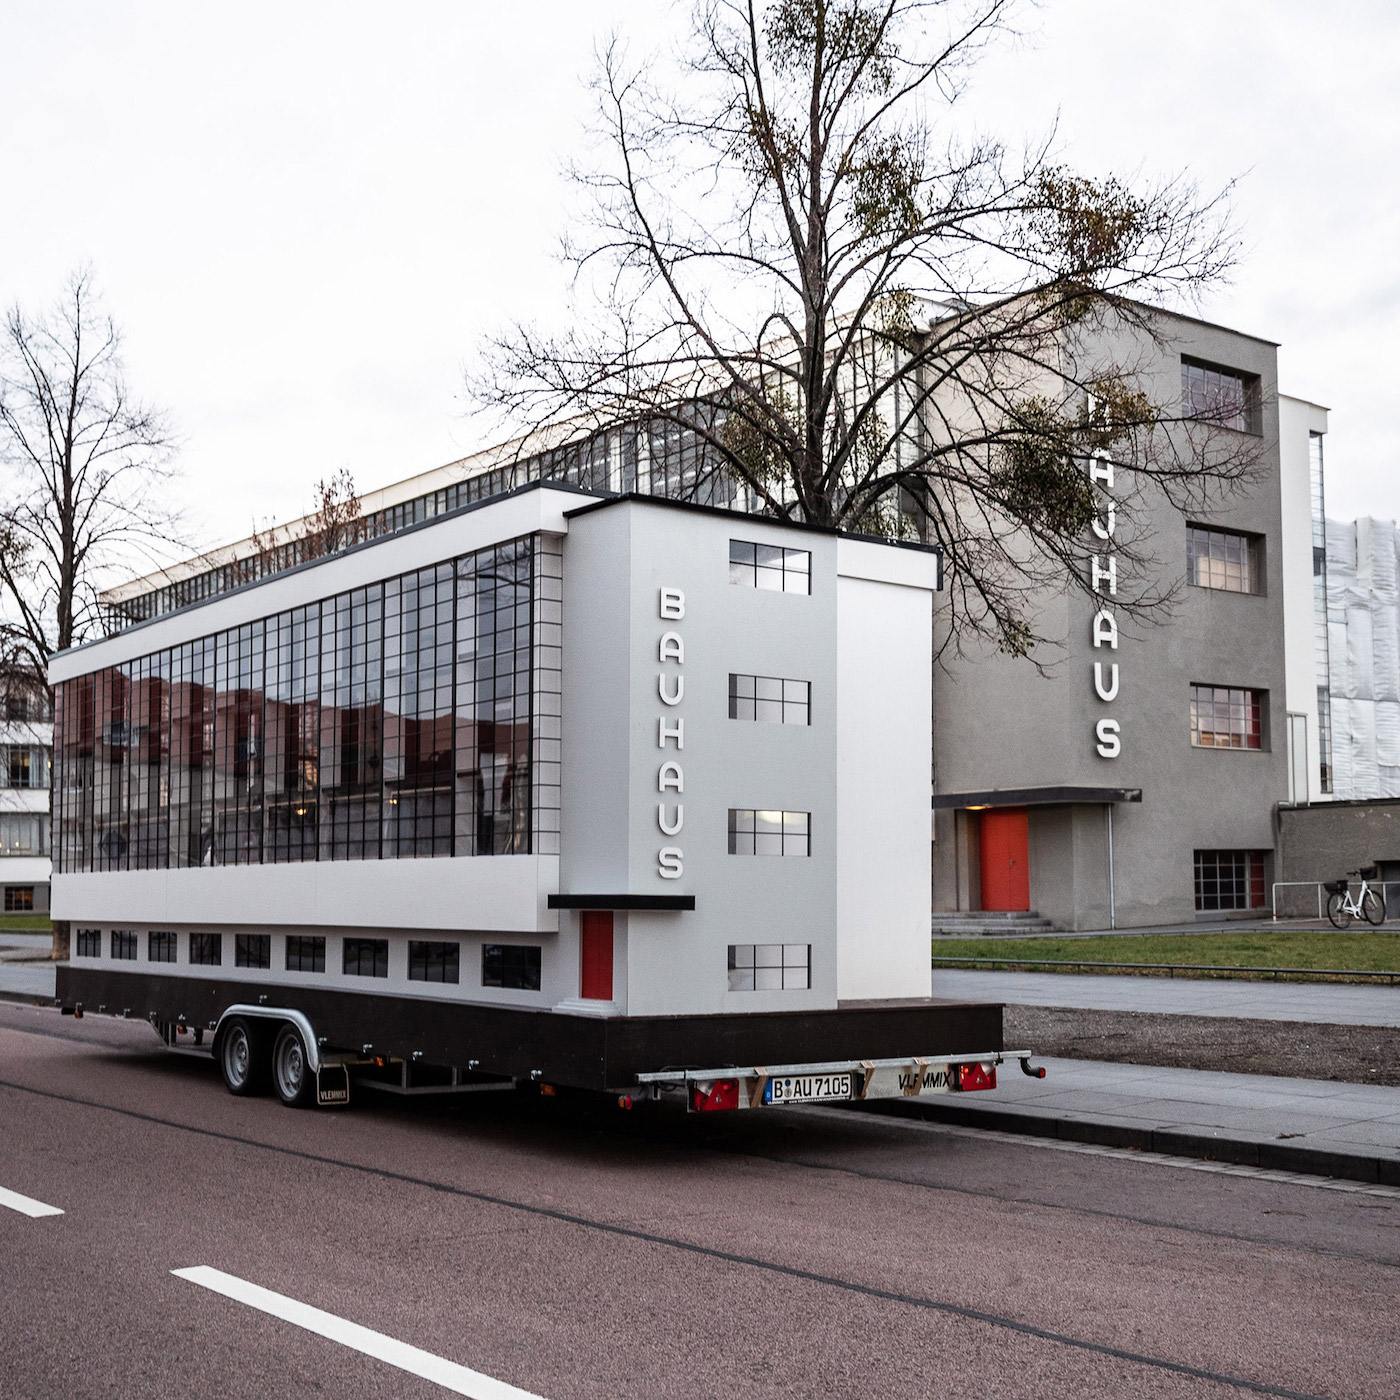 Bauhaus Bus Embarks on World Tour to Explore a Global Legacy